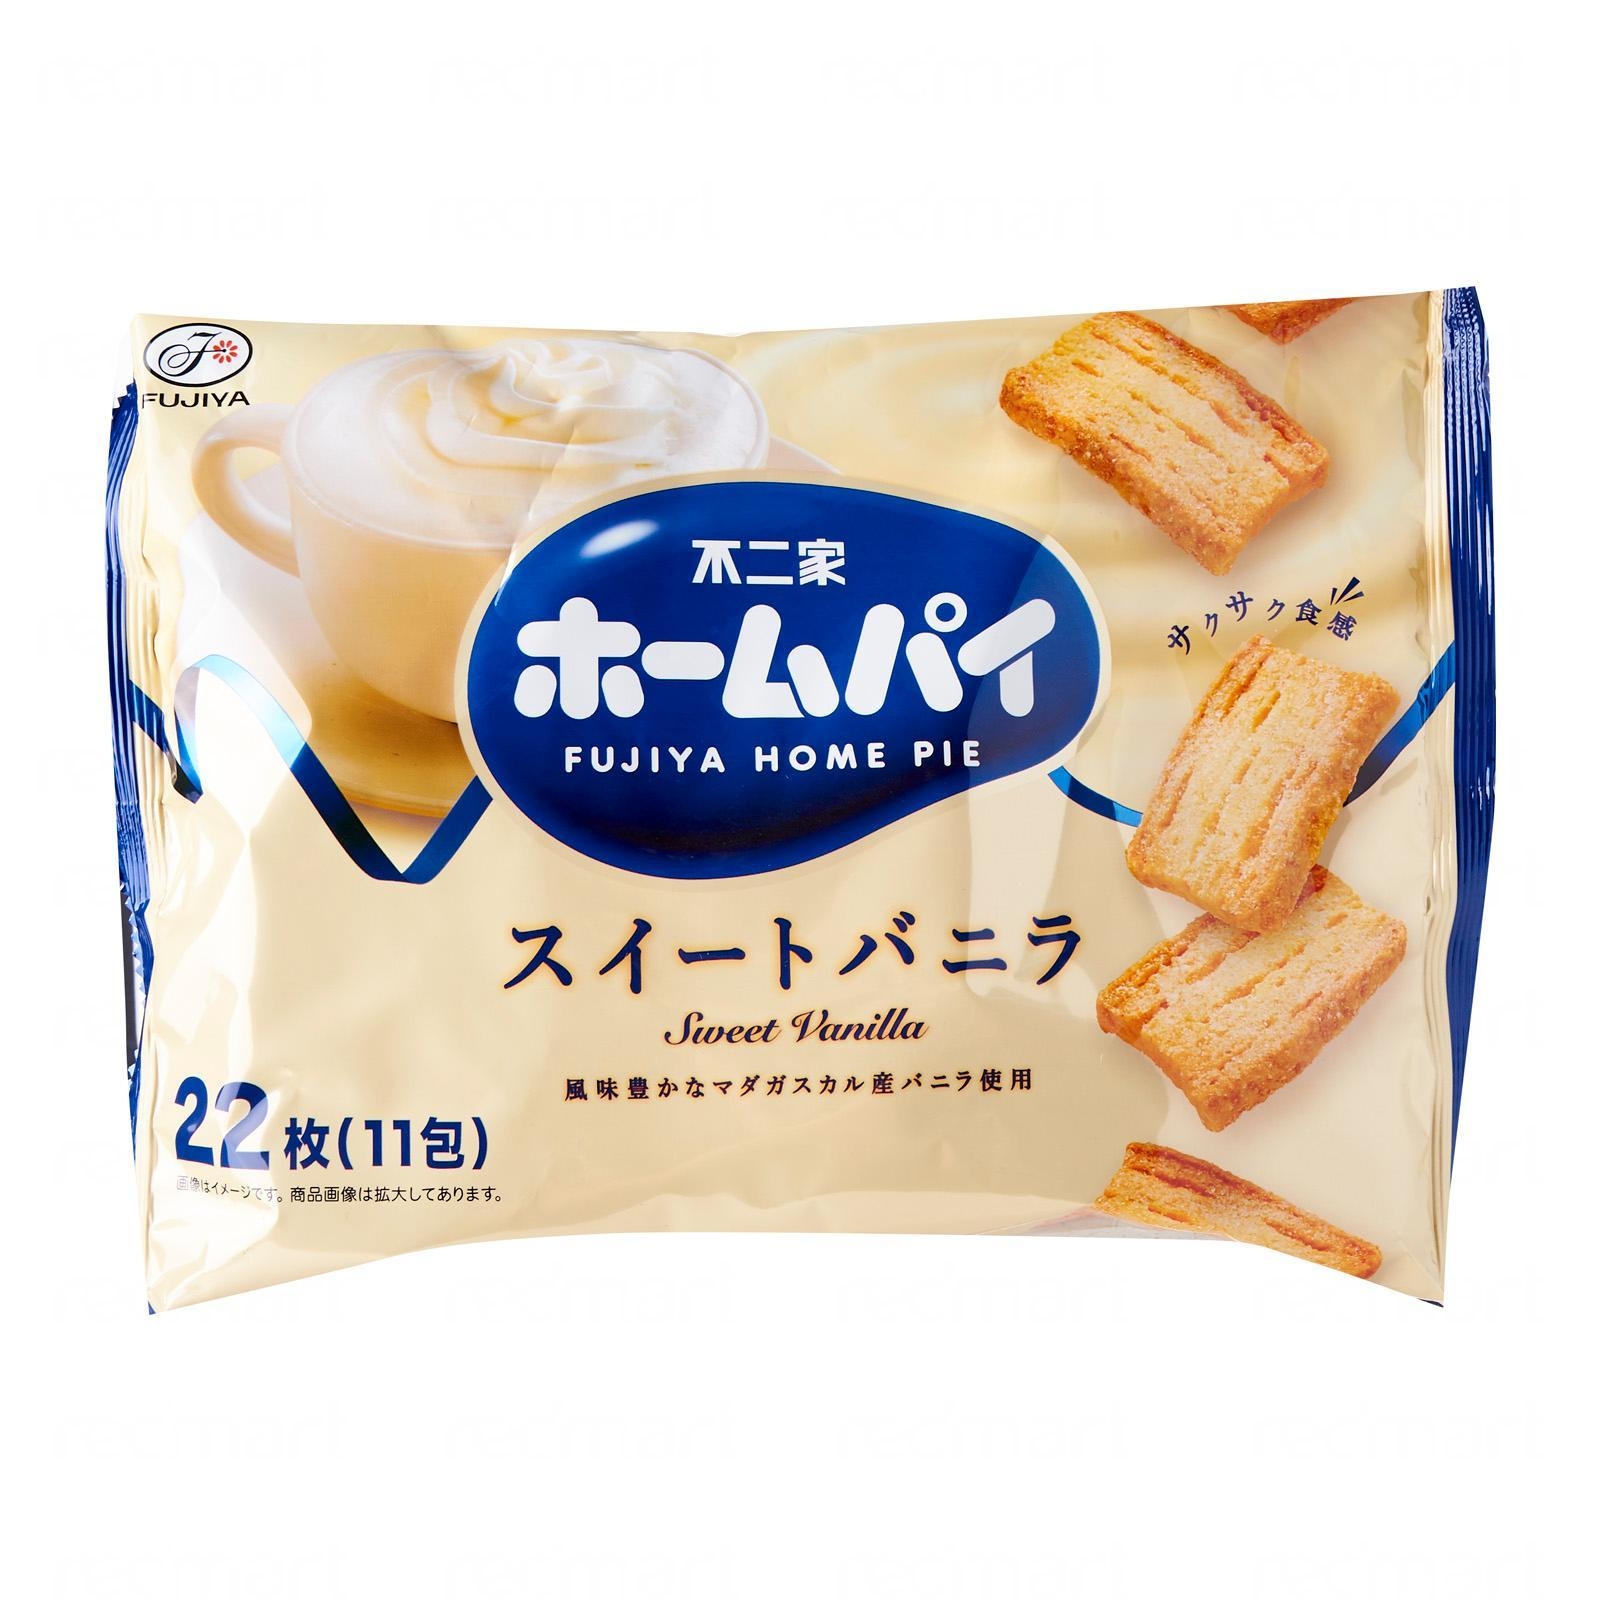 Fujiya Sweet Vanilla Flavour Home Pie - Jetro Special